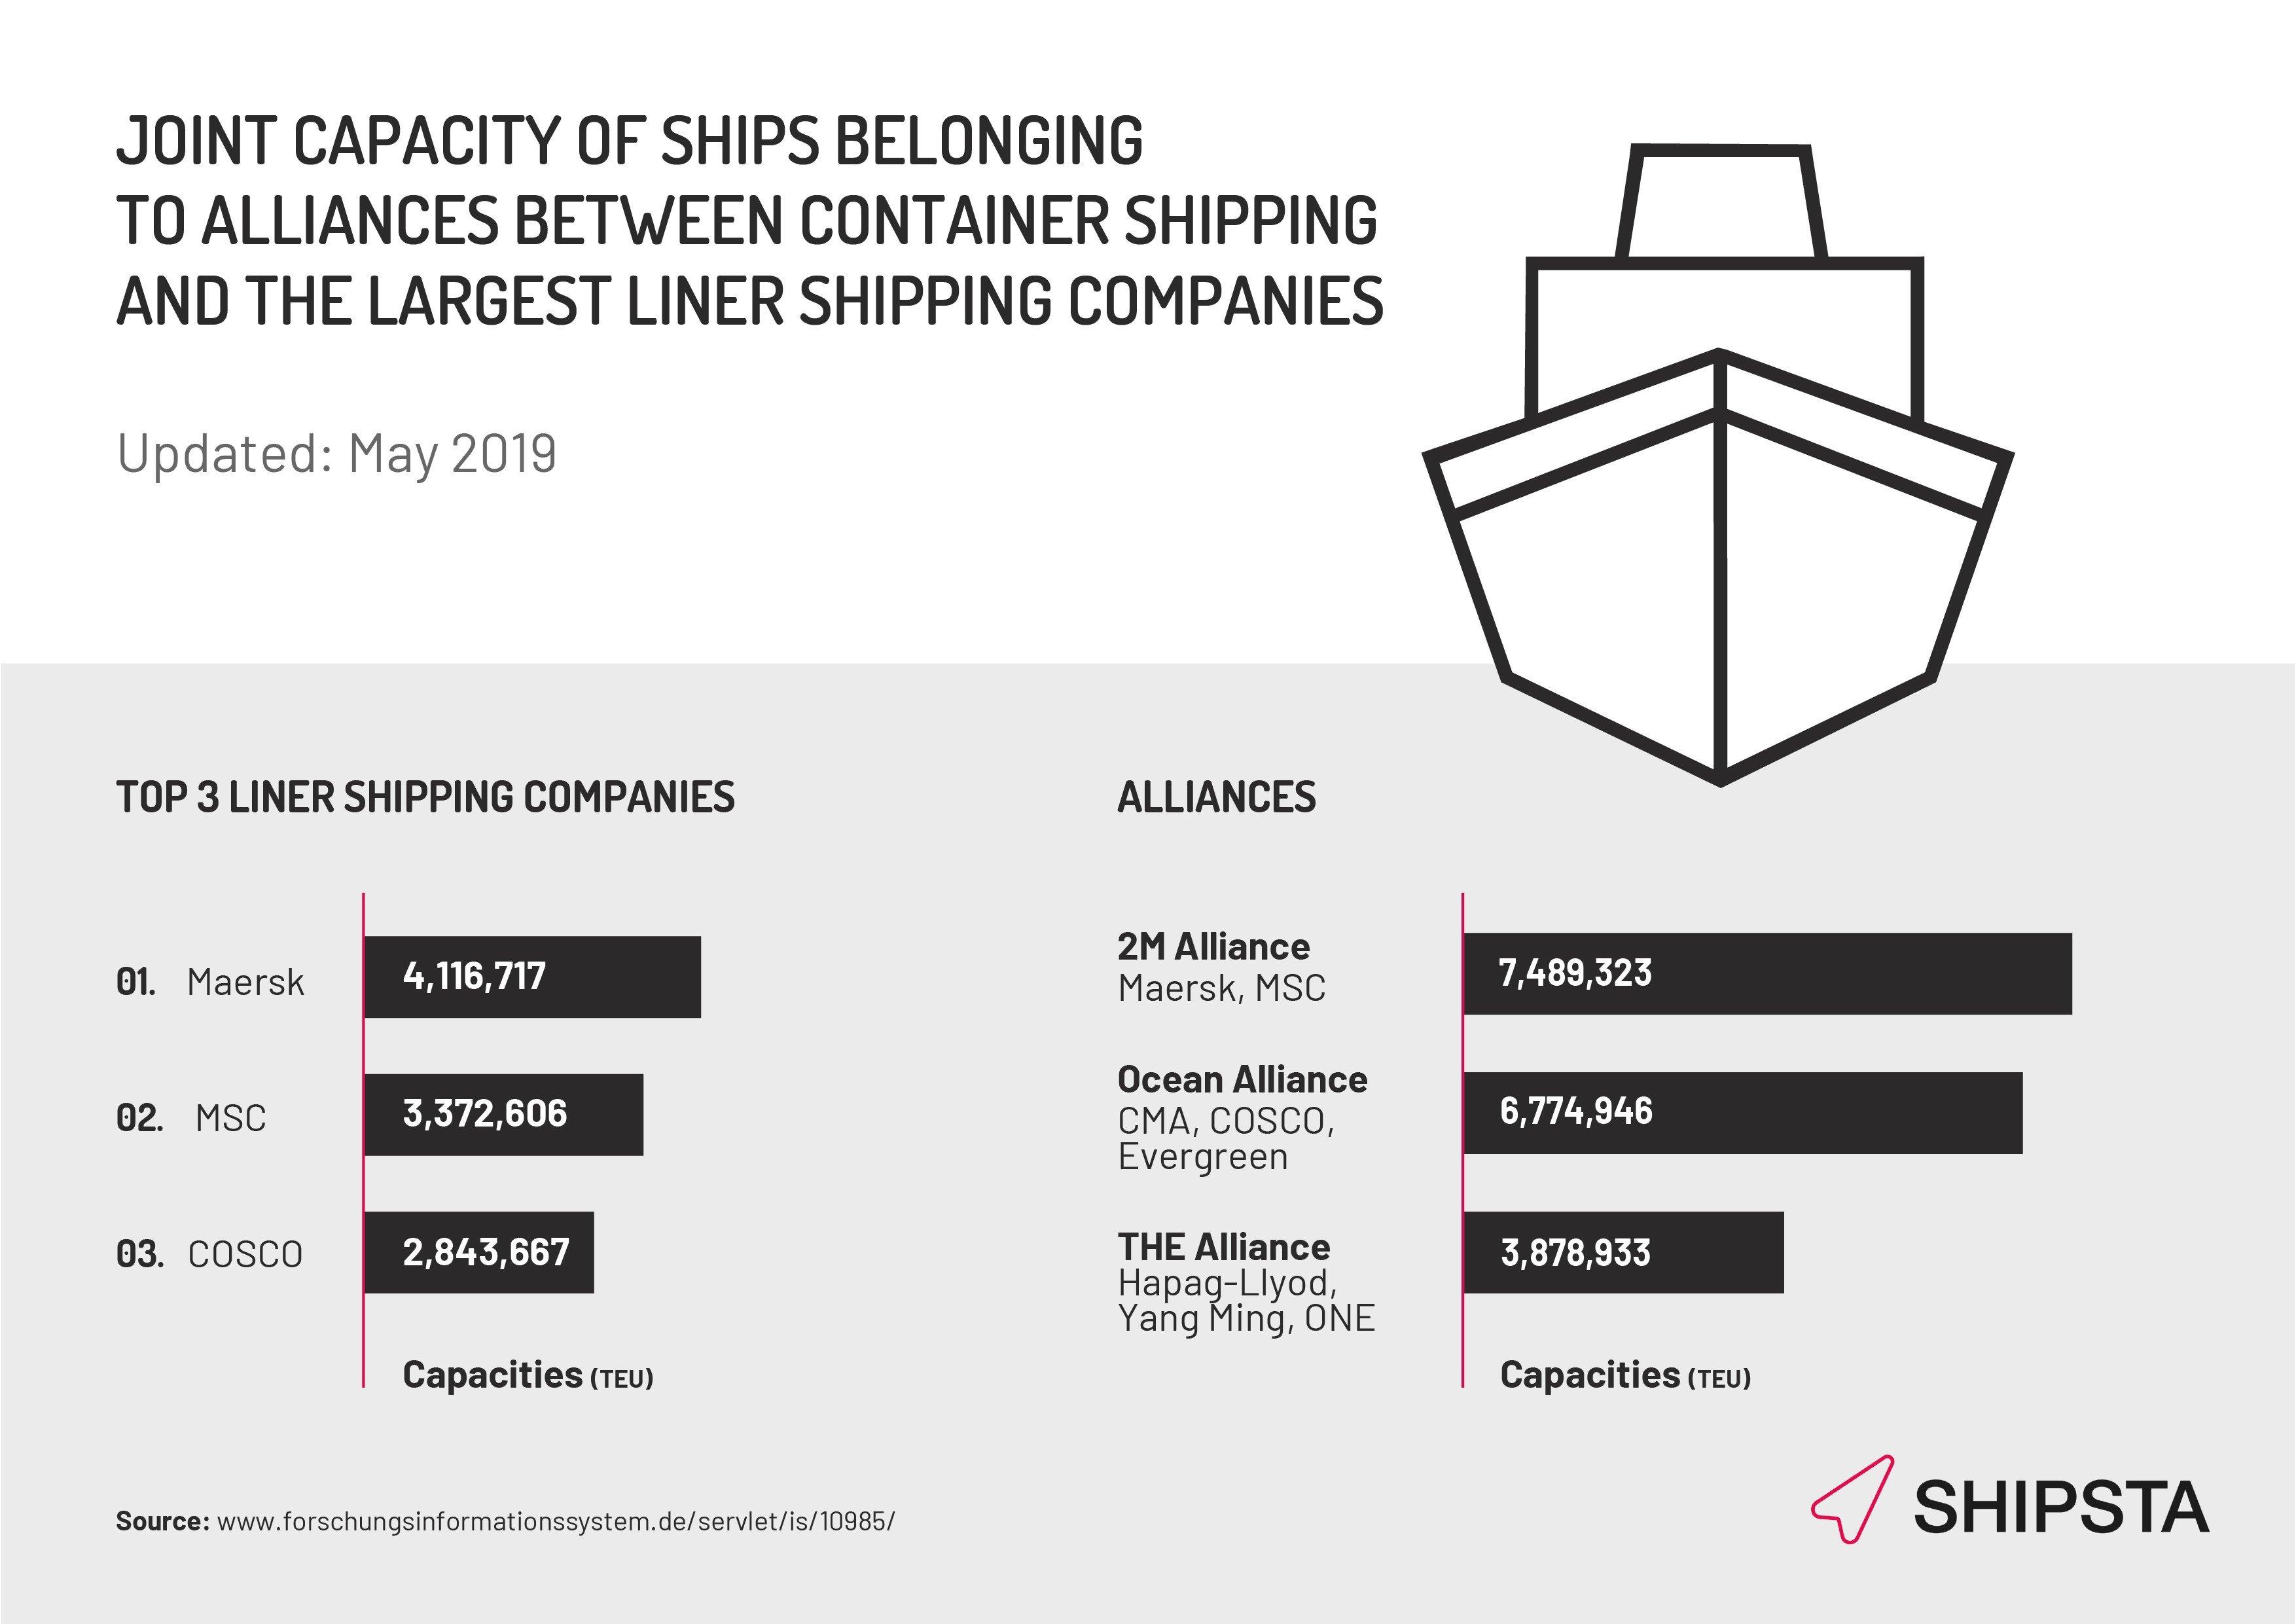 SHIPSTA-container-shipping-alliances